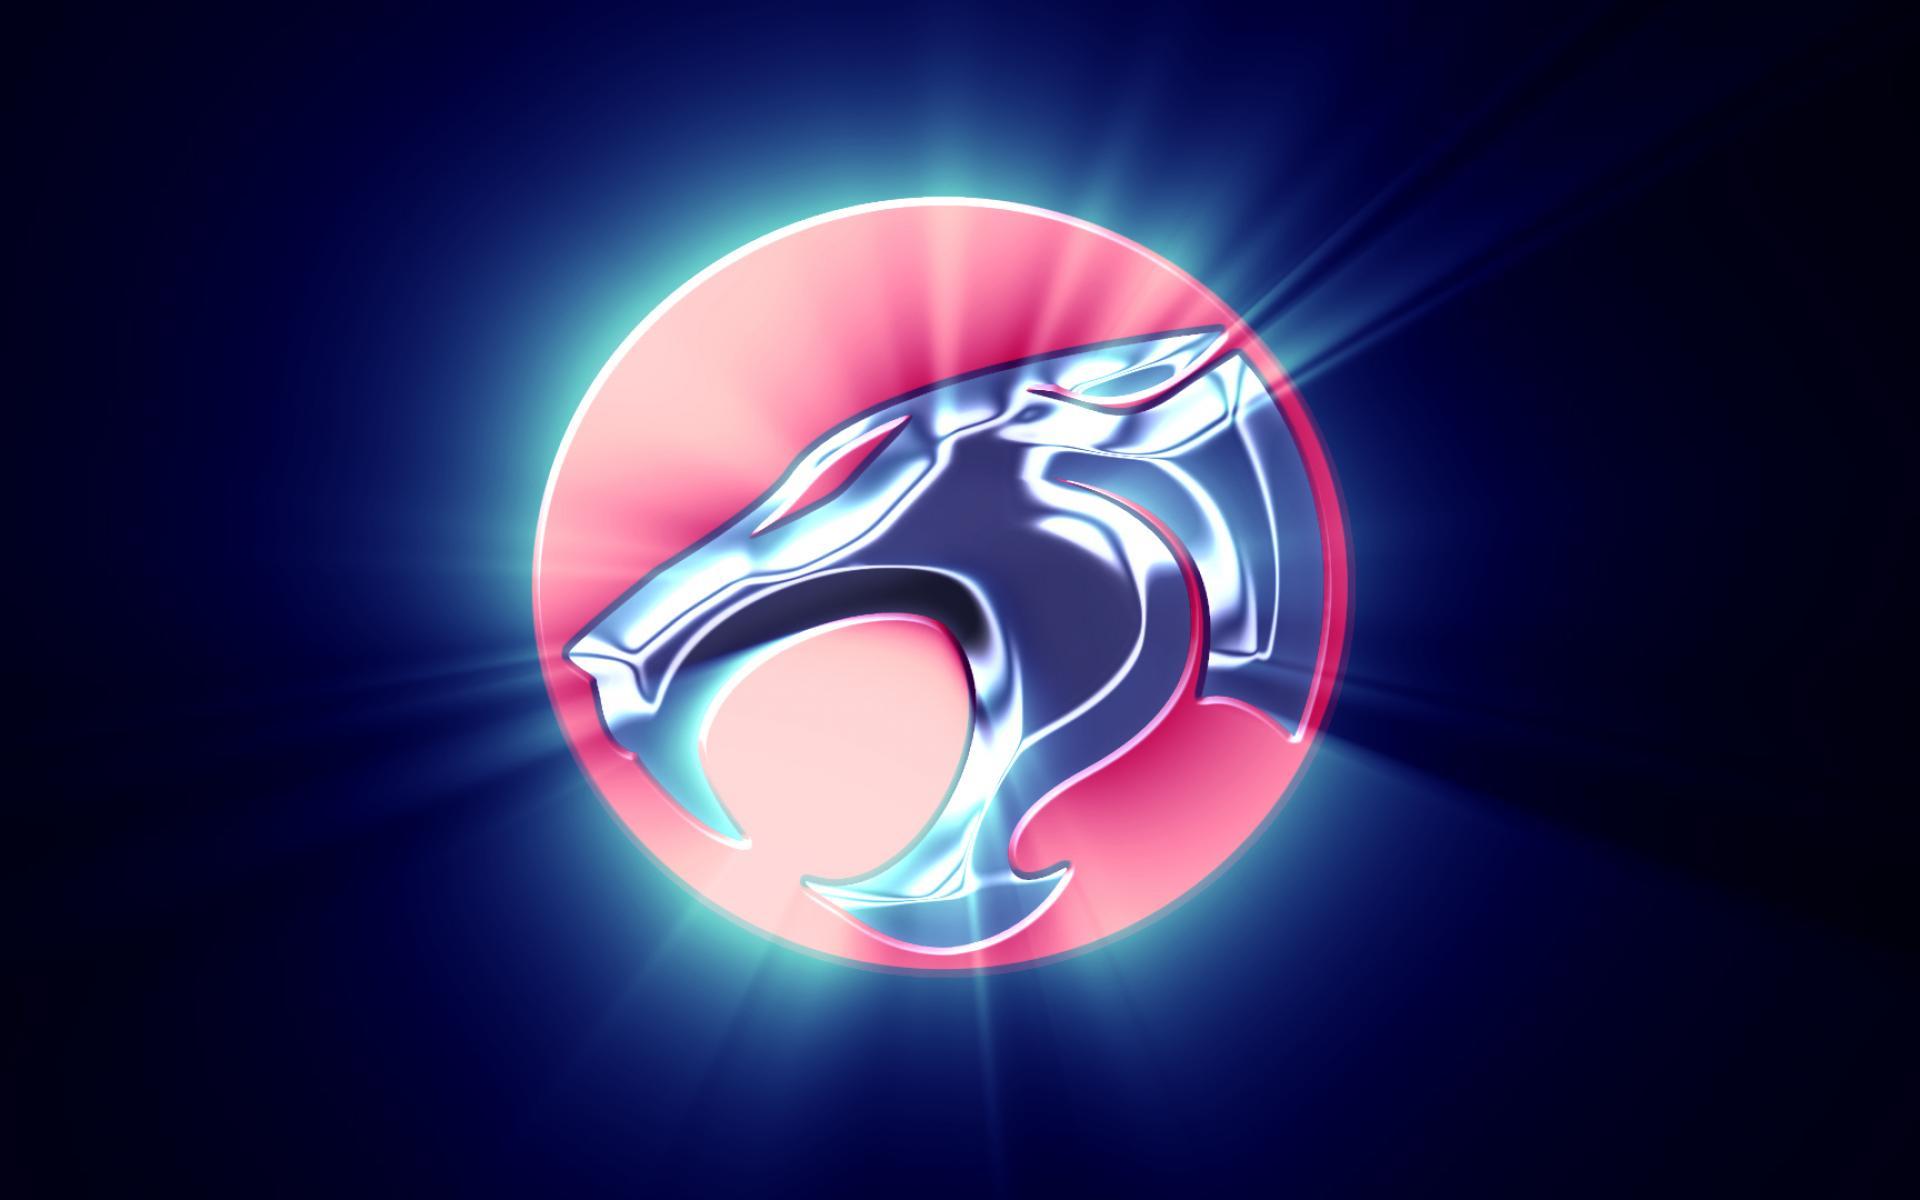 Thundercats Logo wallpaper 218020 1920x1200